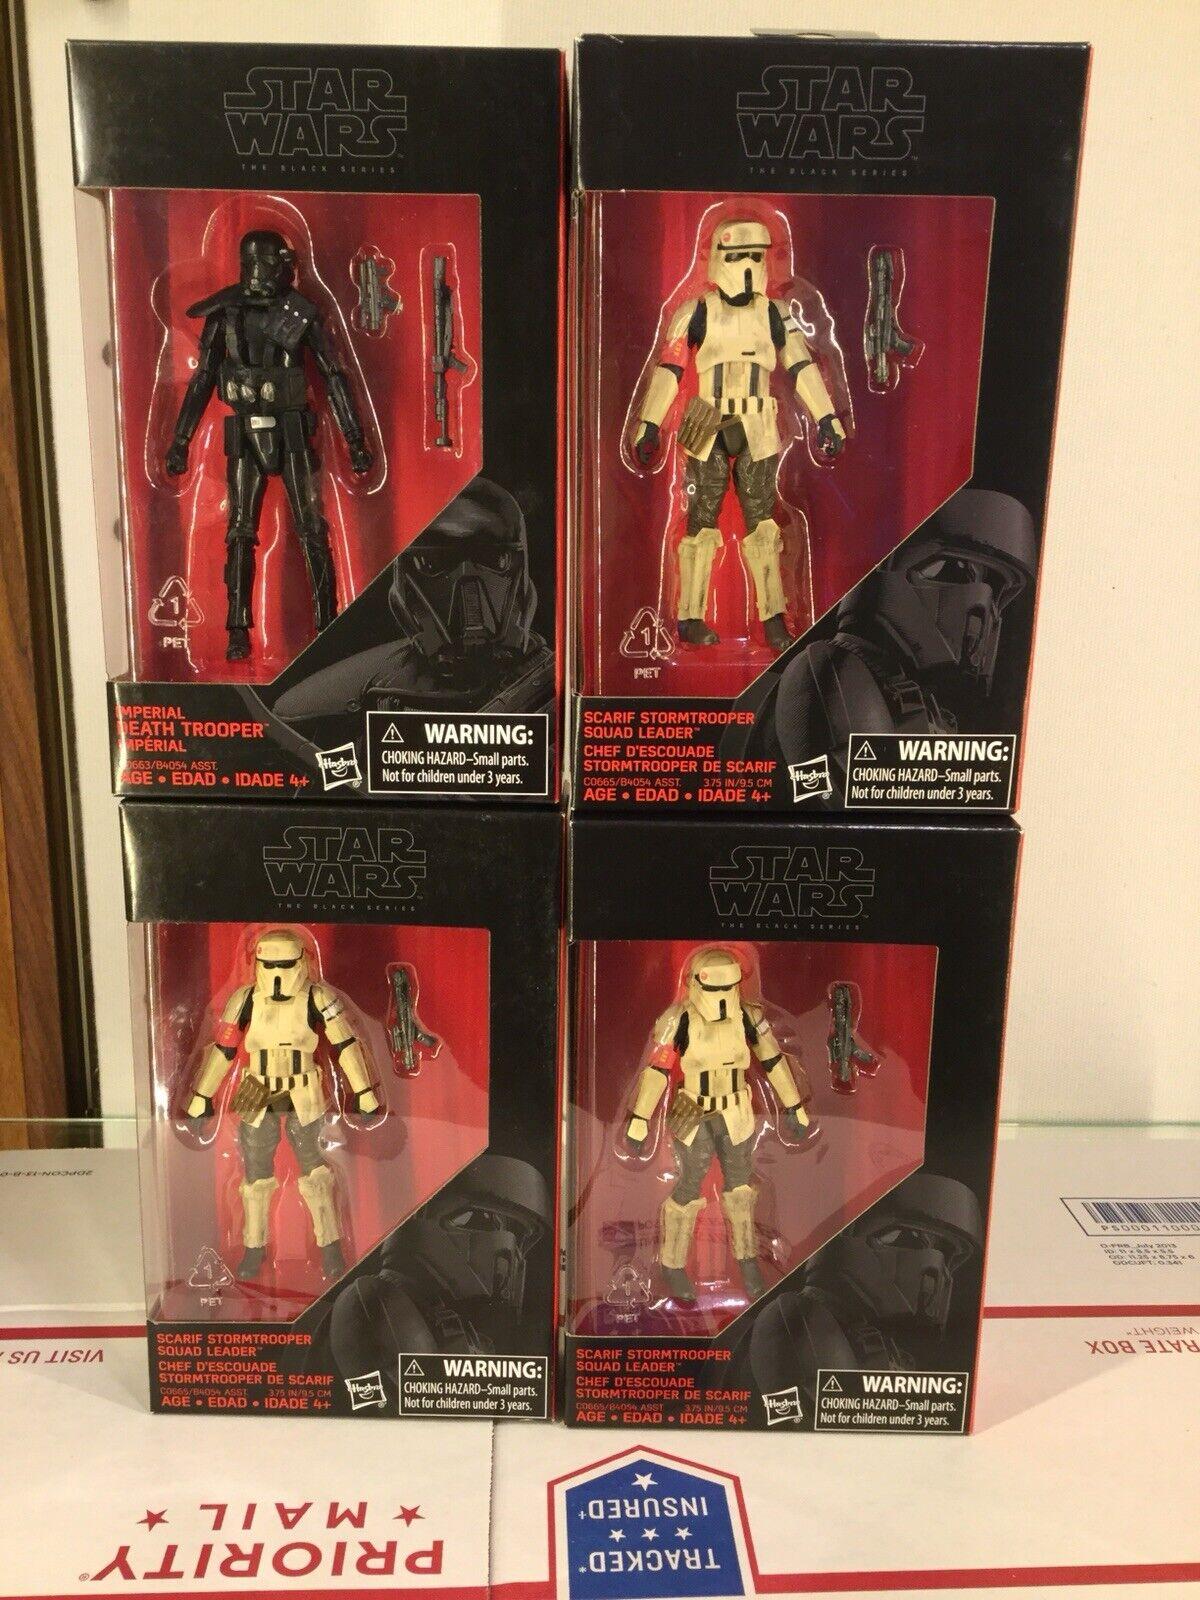 Star Wars SvoitureIF Stormtrooper 3.75 IN (environ  9.52 cm) & Imperial Death Trooper 3.75  remise